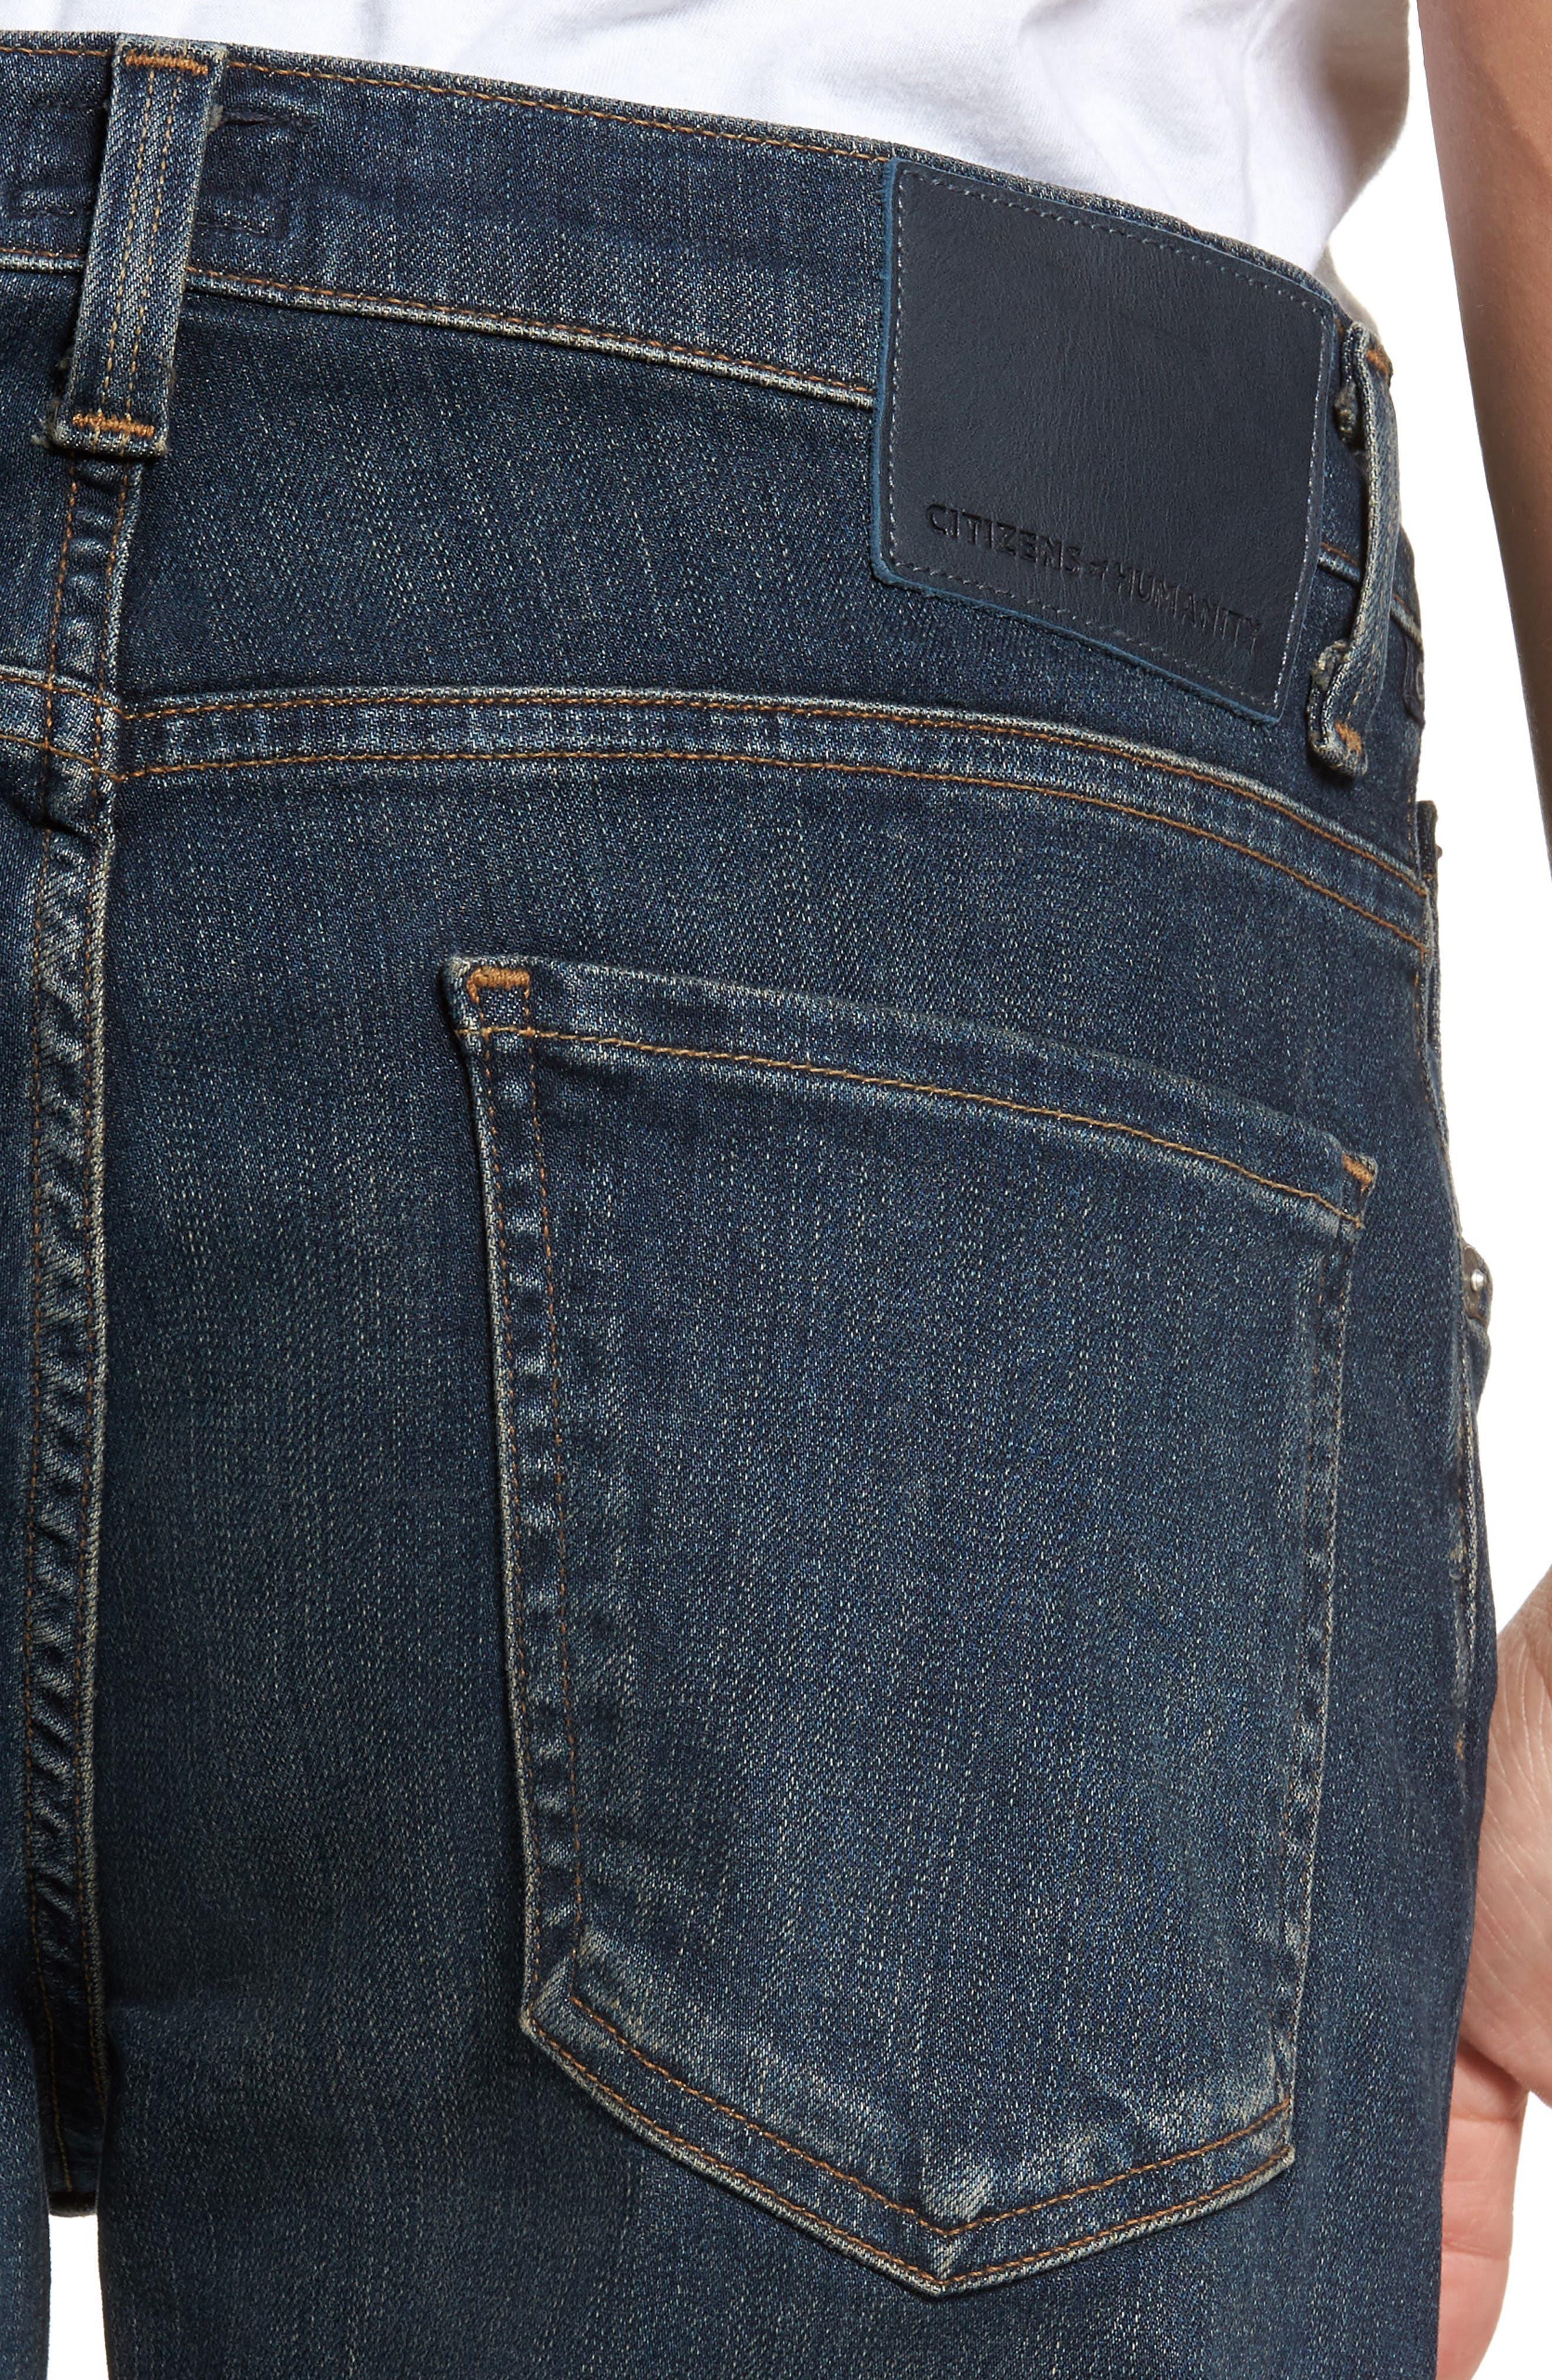 PERFORM - Bowery Slim Fit Jeans,                             Alternate thumbnail 4, color,                             Kingman